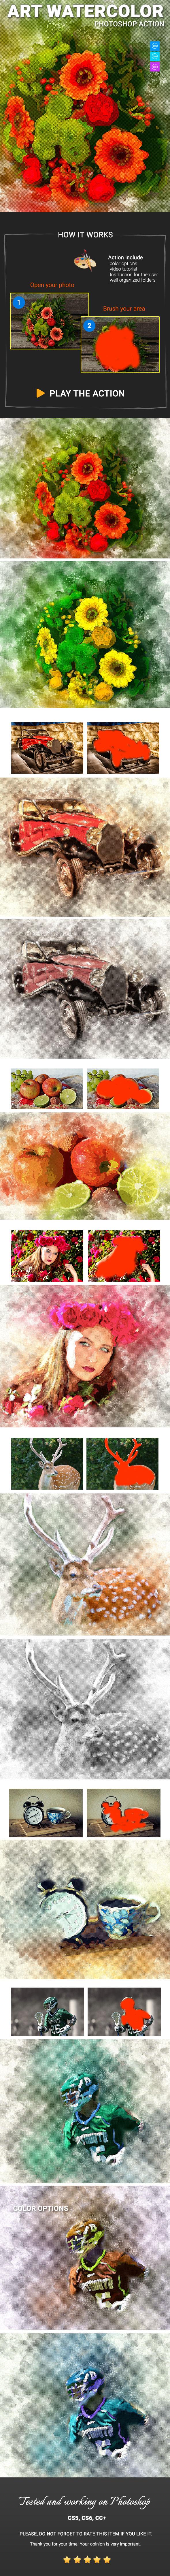 GraphicRiver Art Watercolor Photoshop Action 20746201